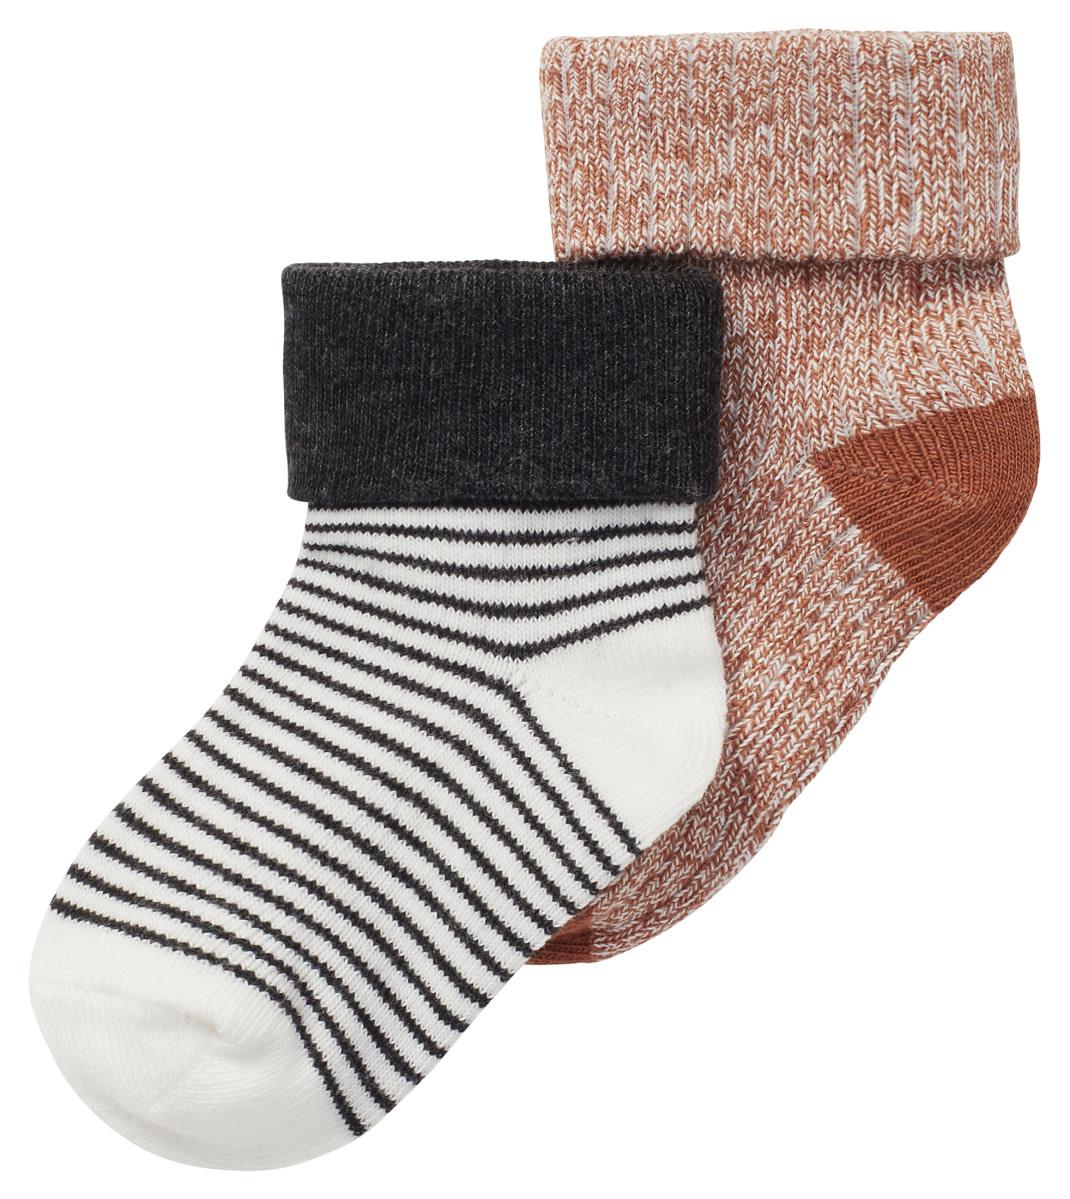 Saltash Socks - 2 Pack